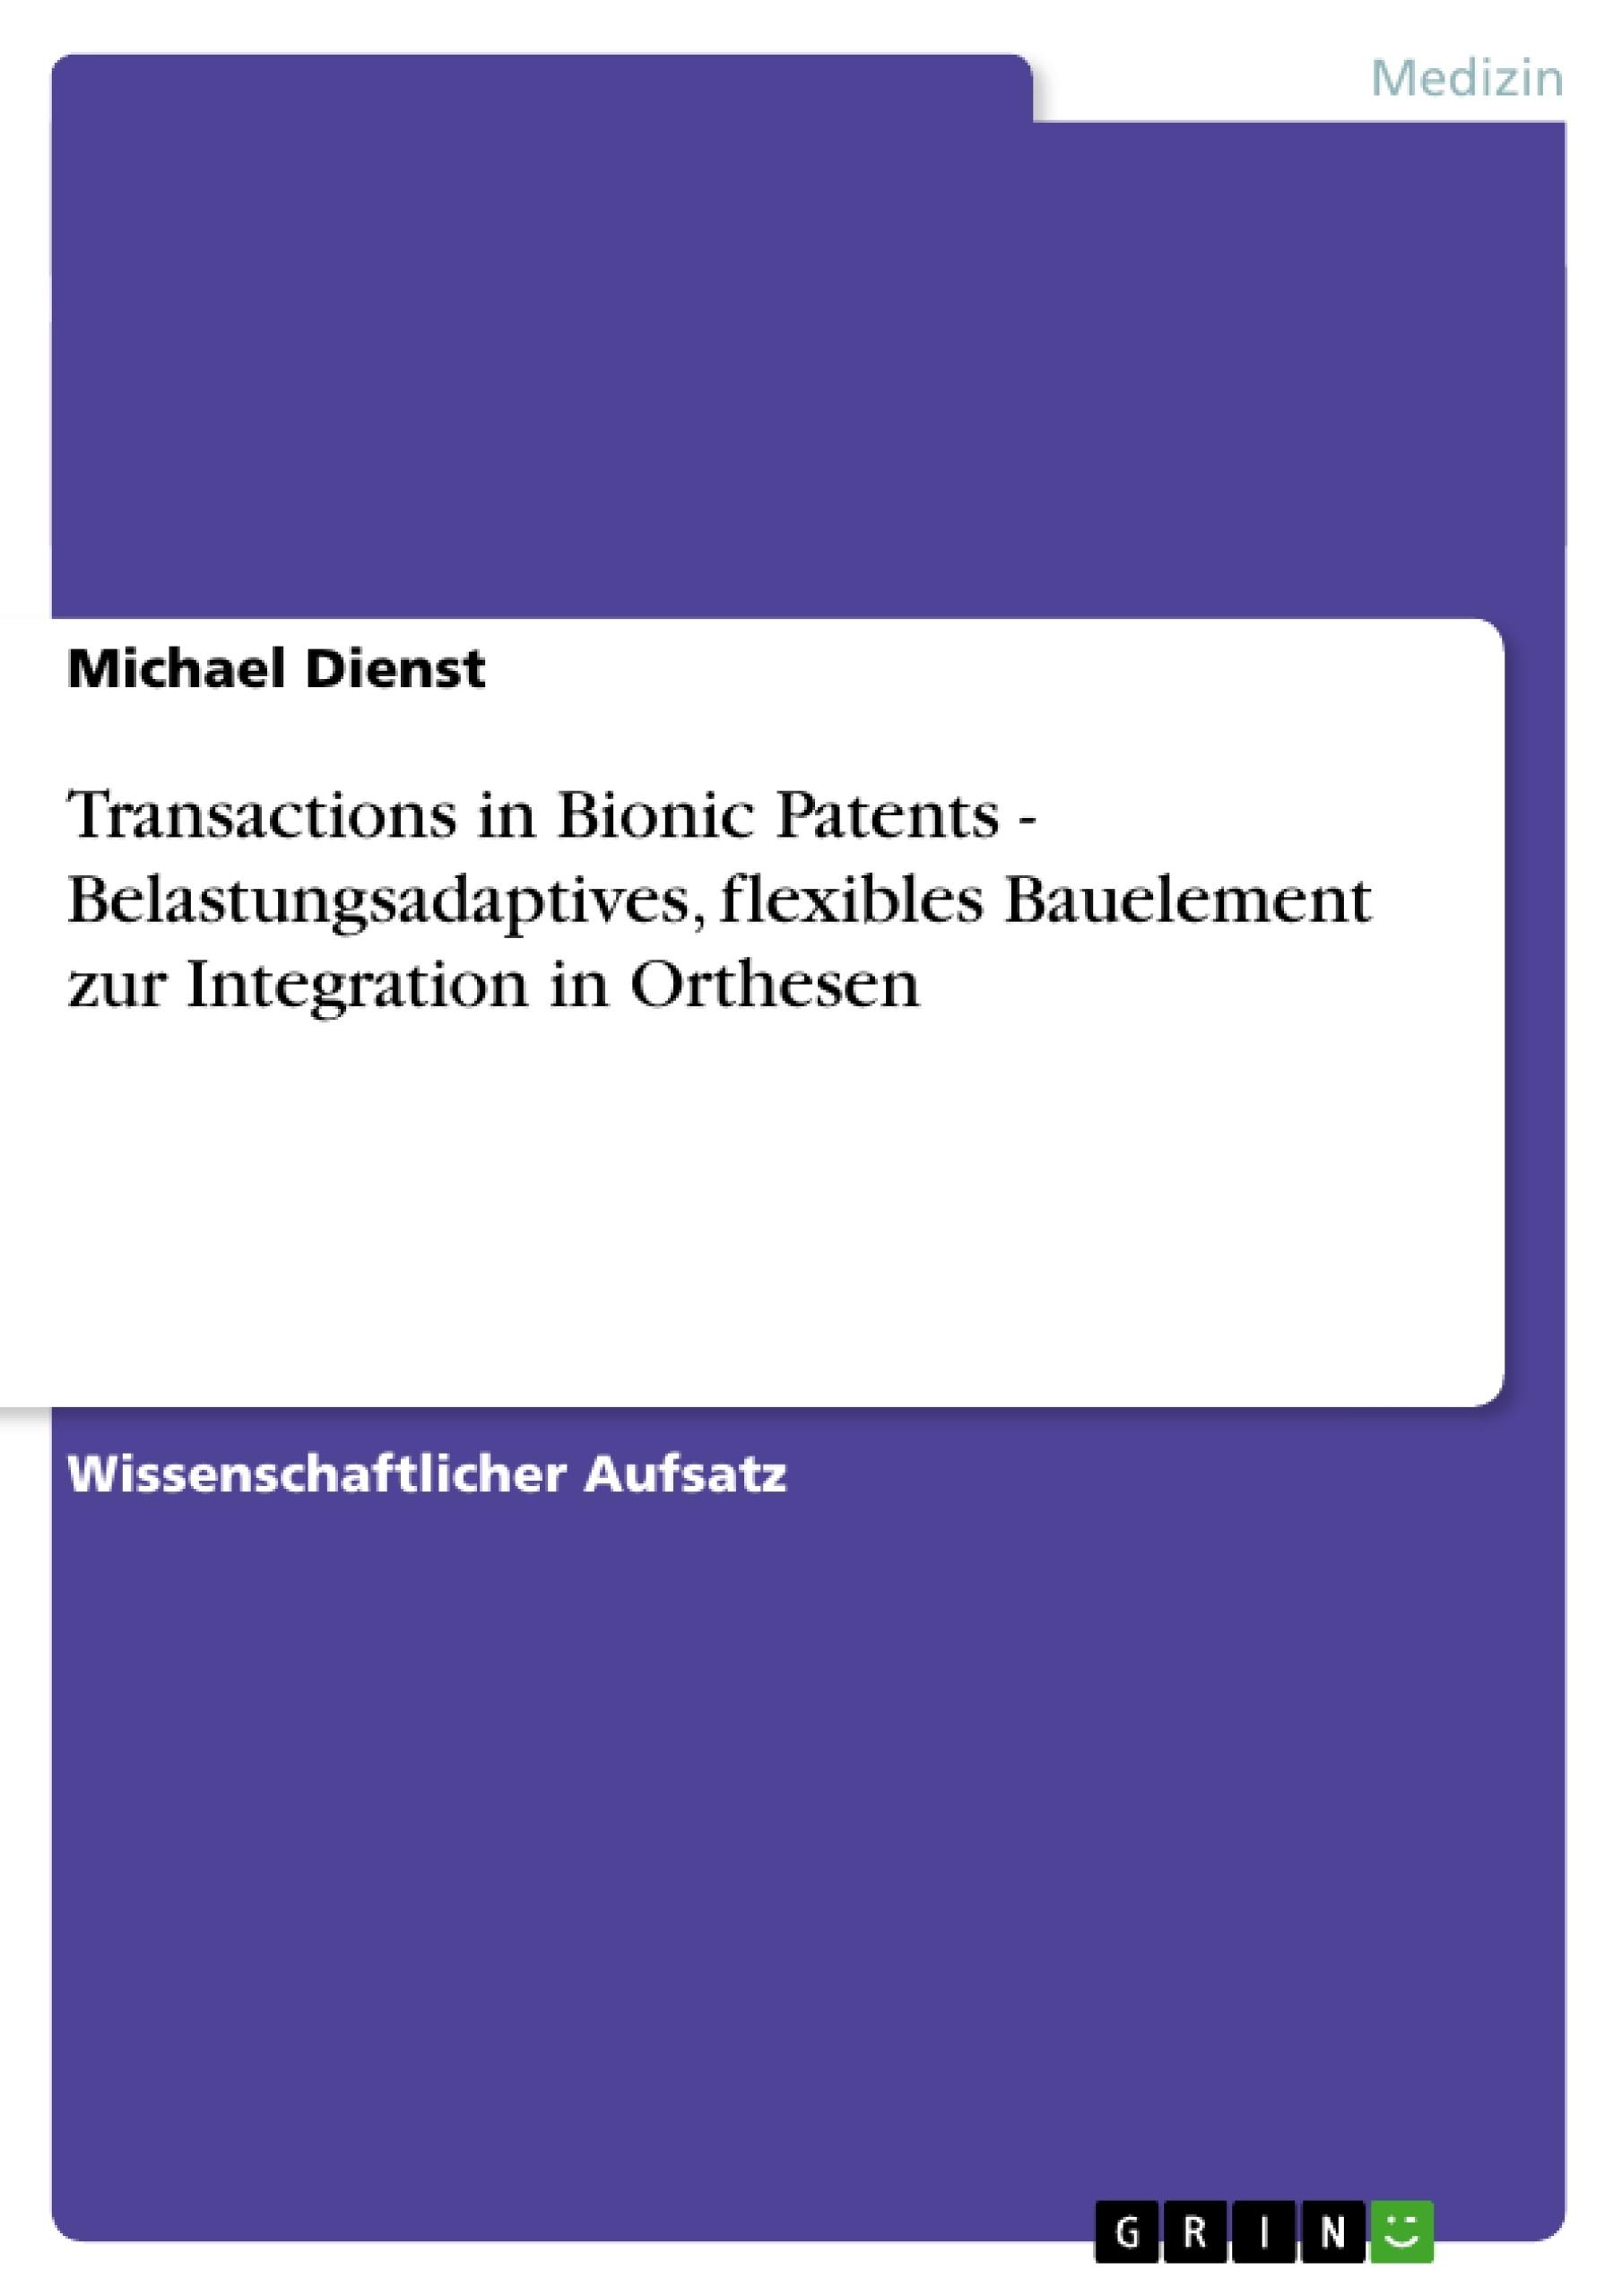 Titel: Transactions in Bionic Patents - Belastungsadaptives, flexibles Bauelement zur Integration in Orthesen